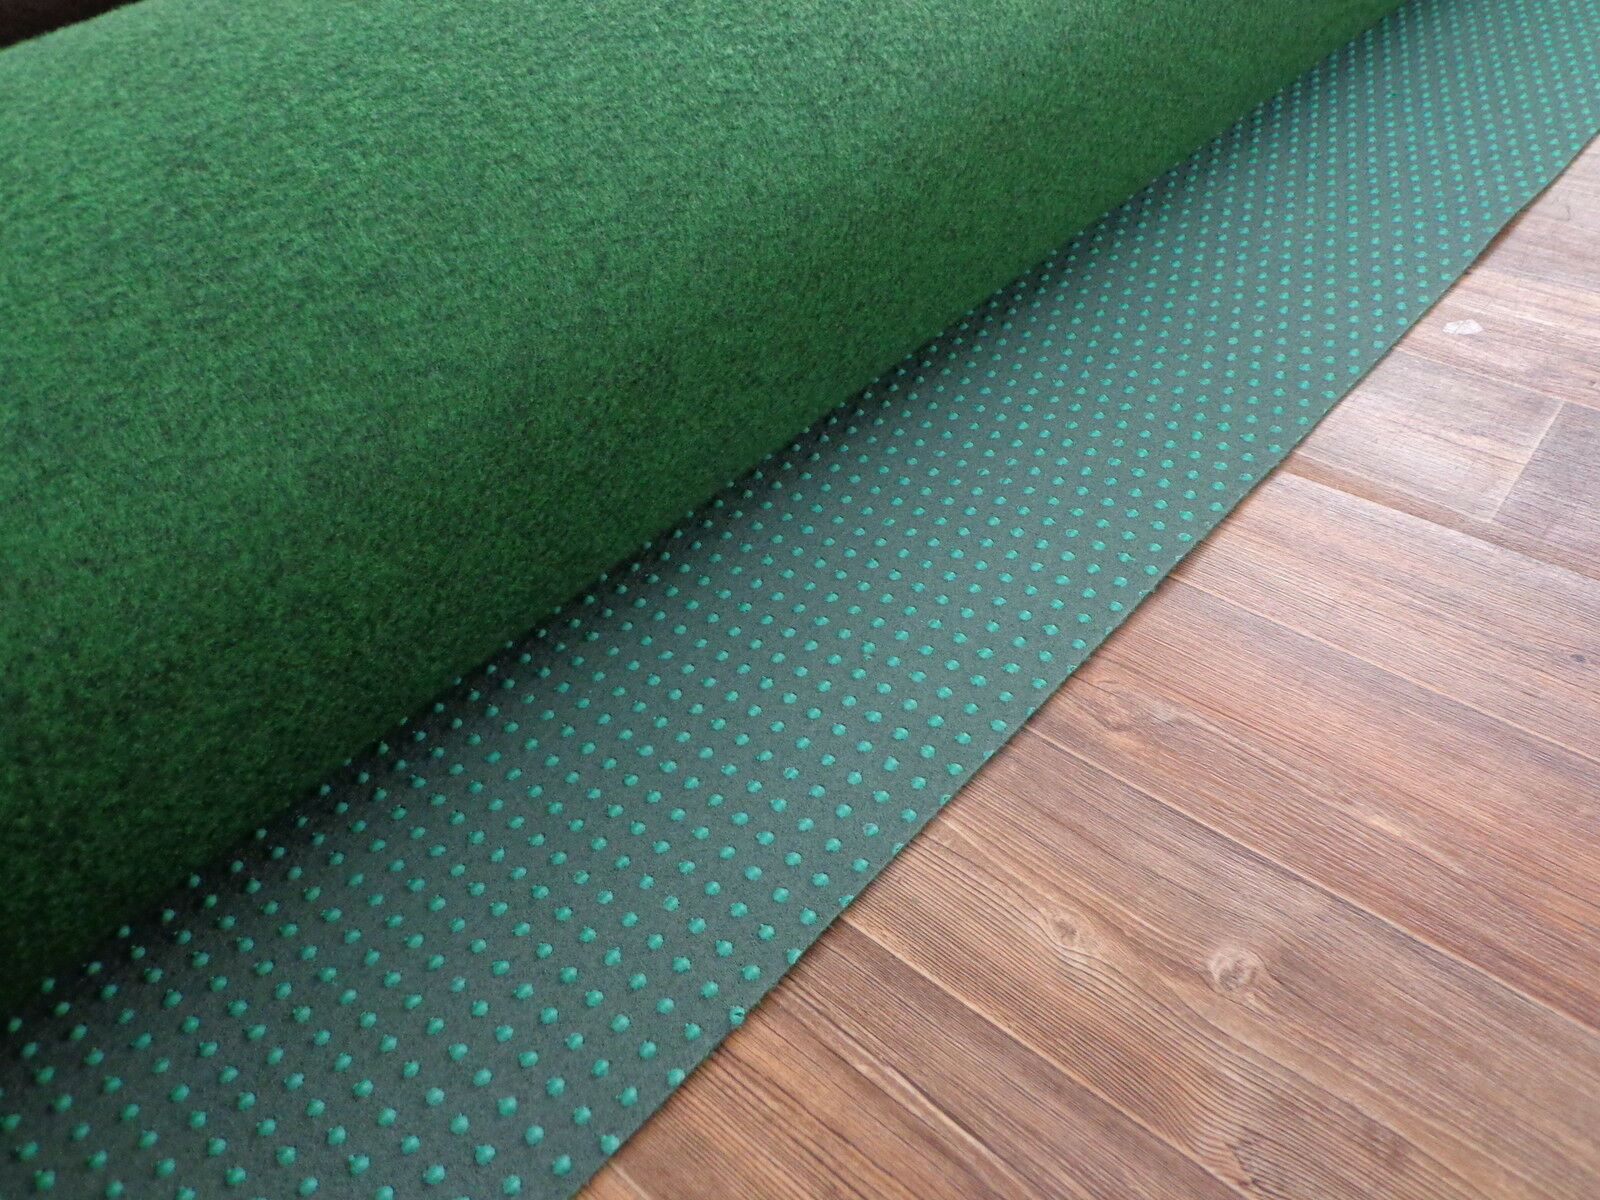 Kunstrasen Rasenteppich (3,79€/m²) Teppich Aktion grün 400 cm Fertigrasen Noppen